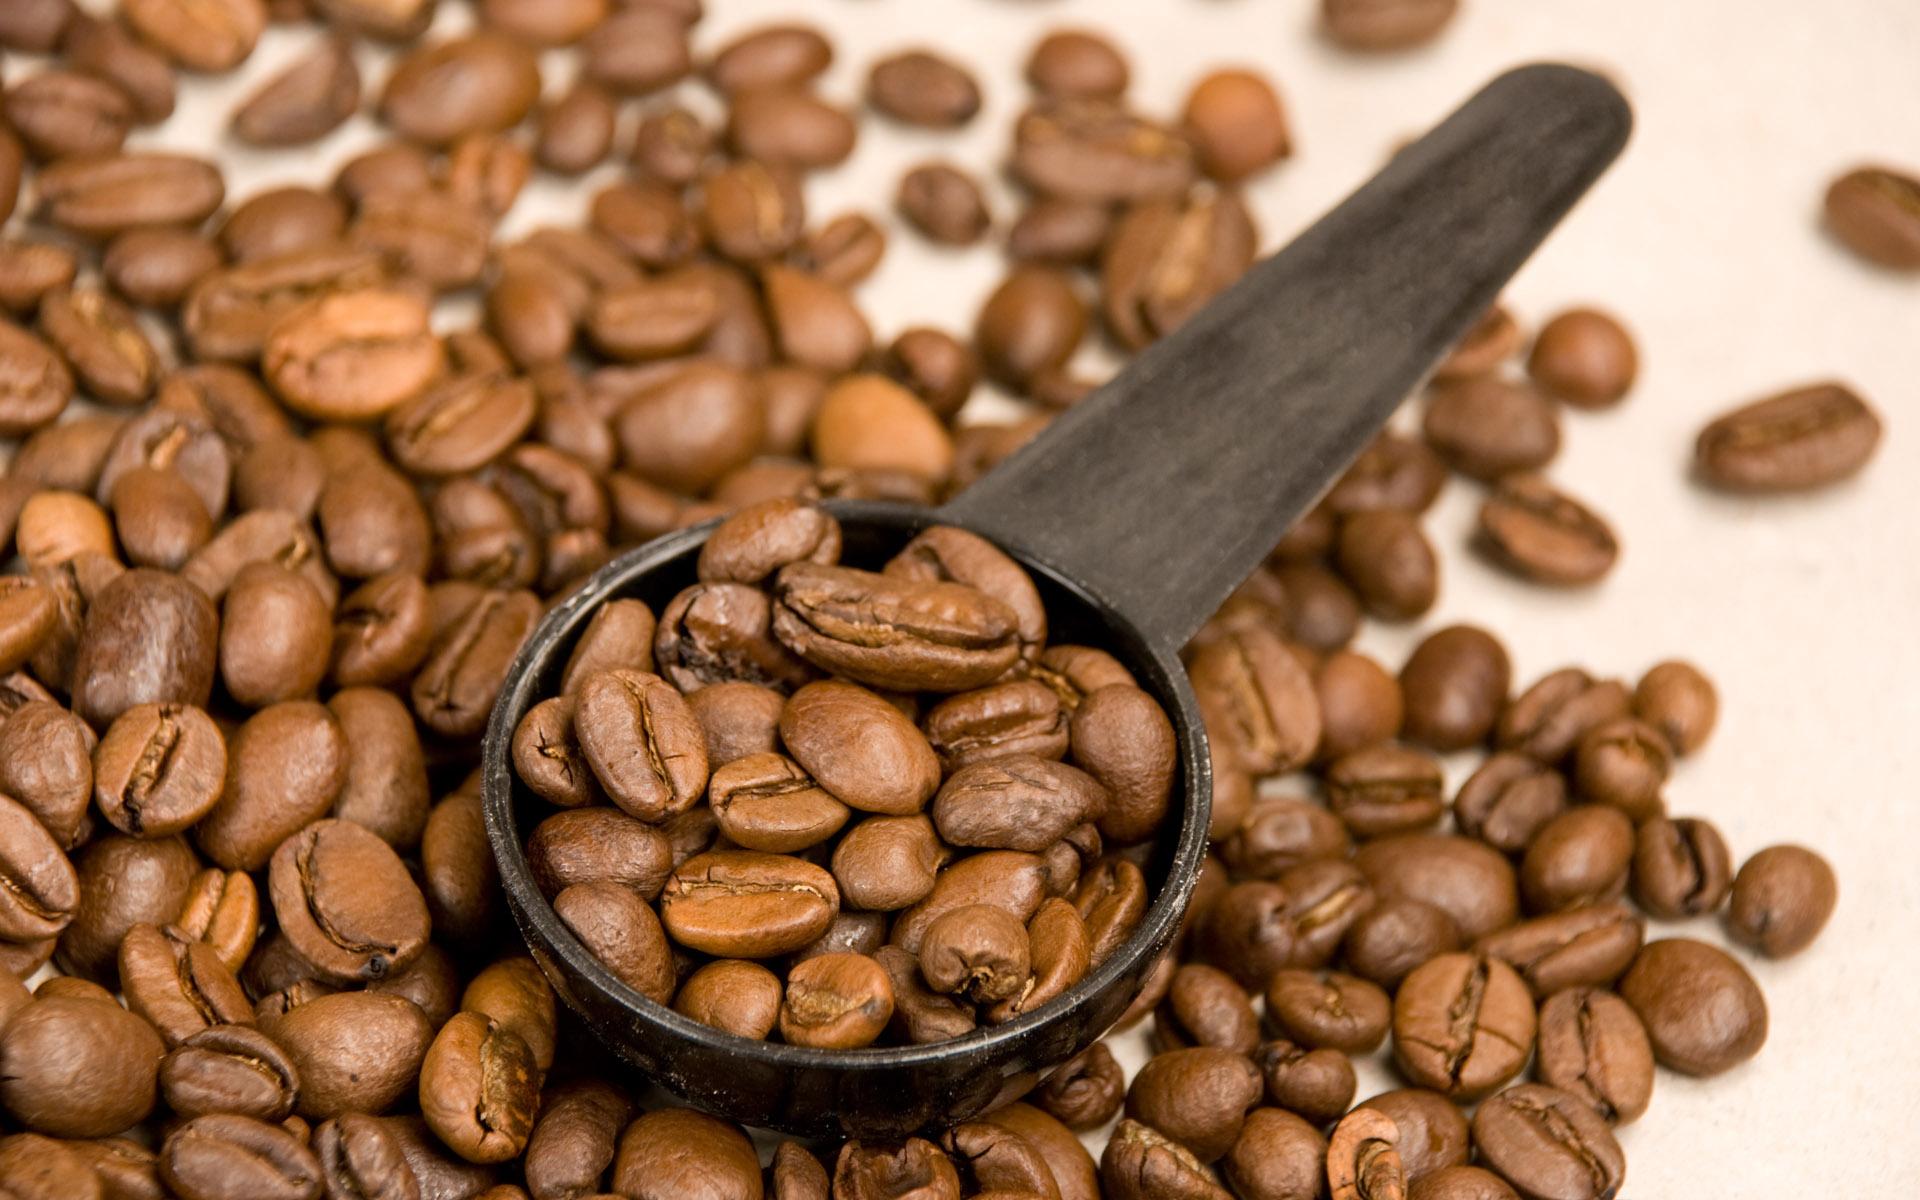 hbw - kahvenin keşfi